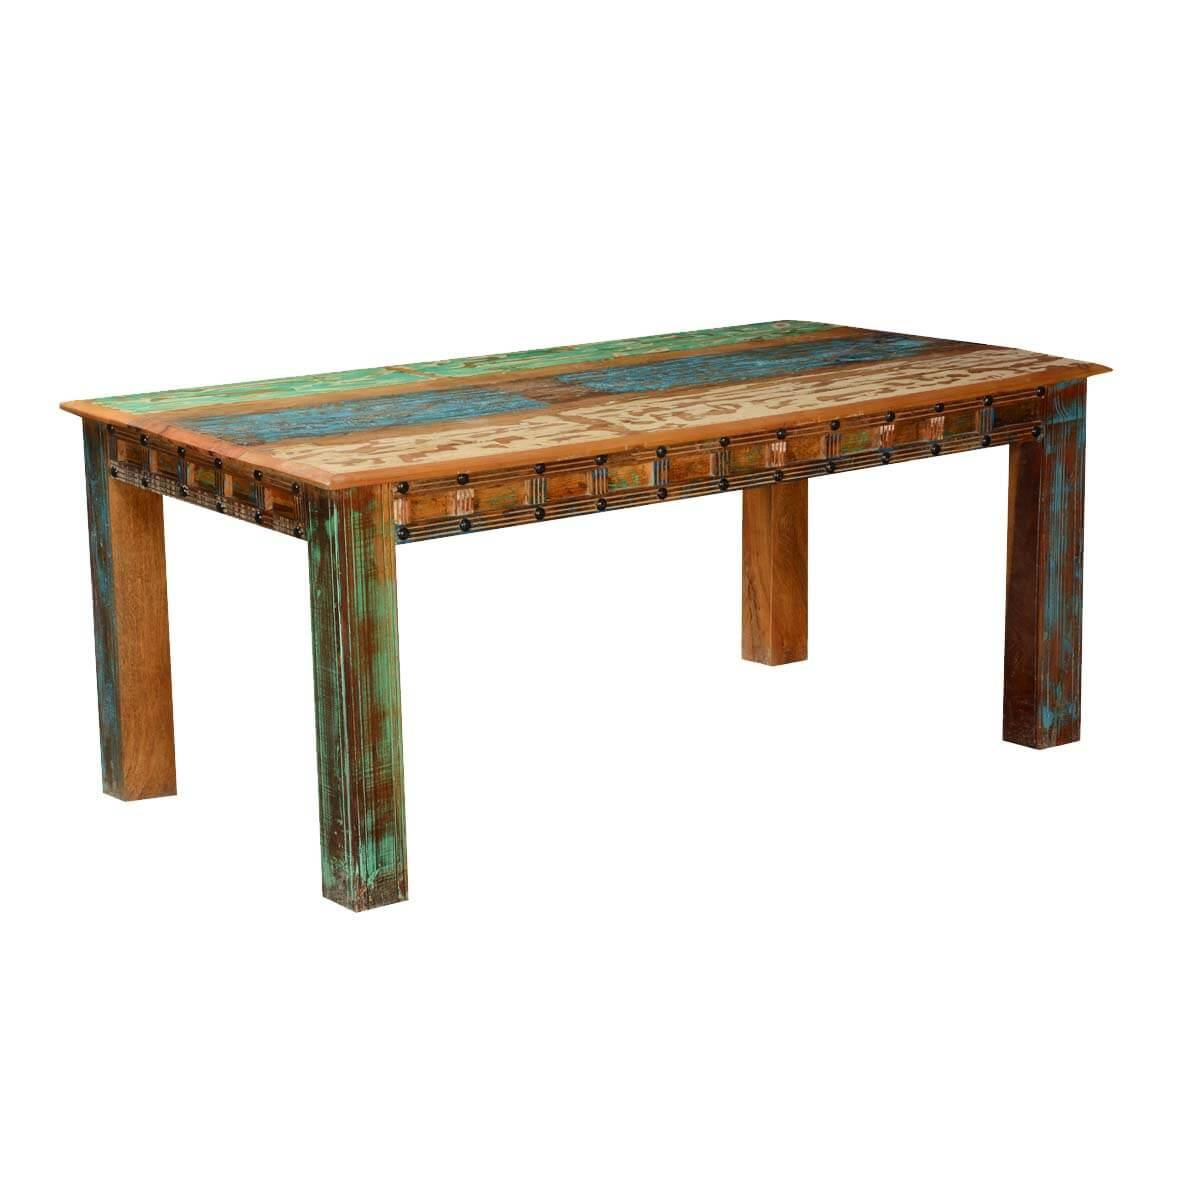 Rustic Rainbow Reclaimed Wood Dining Table